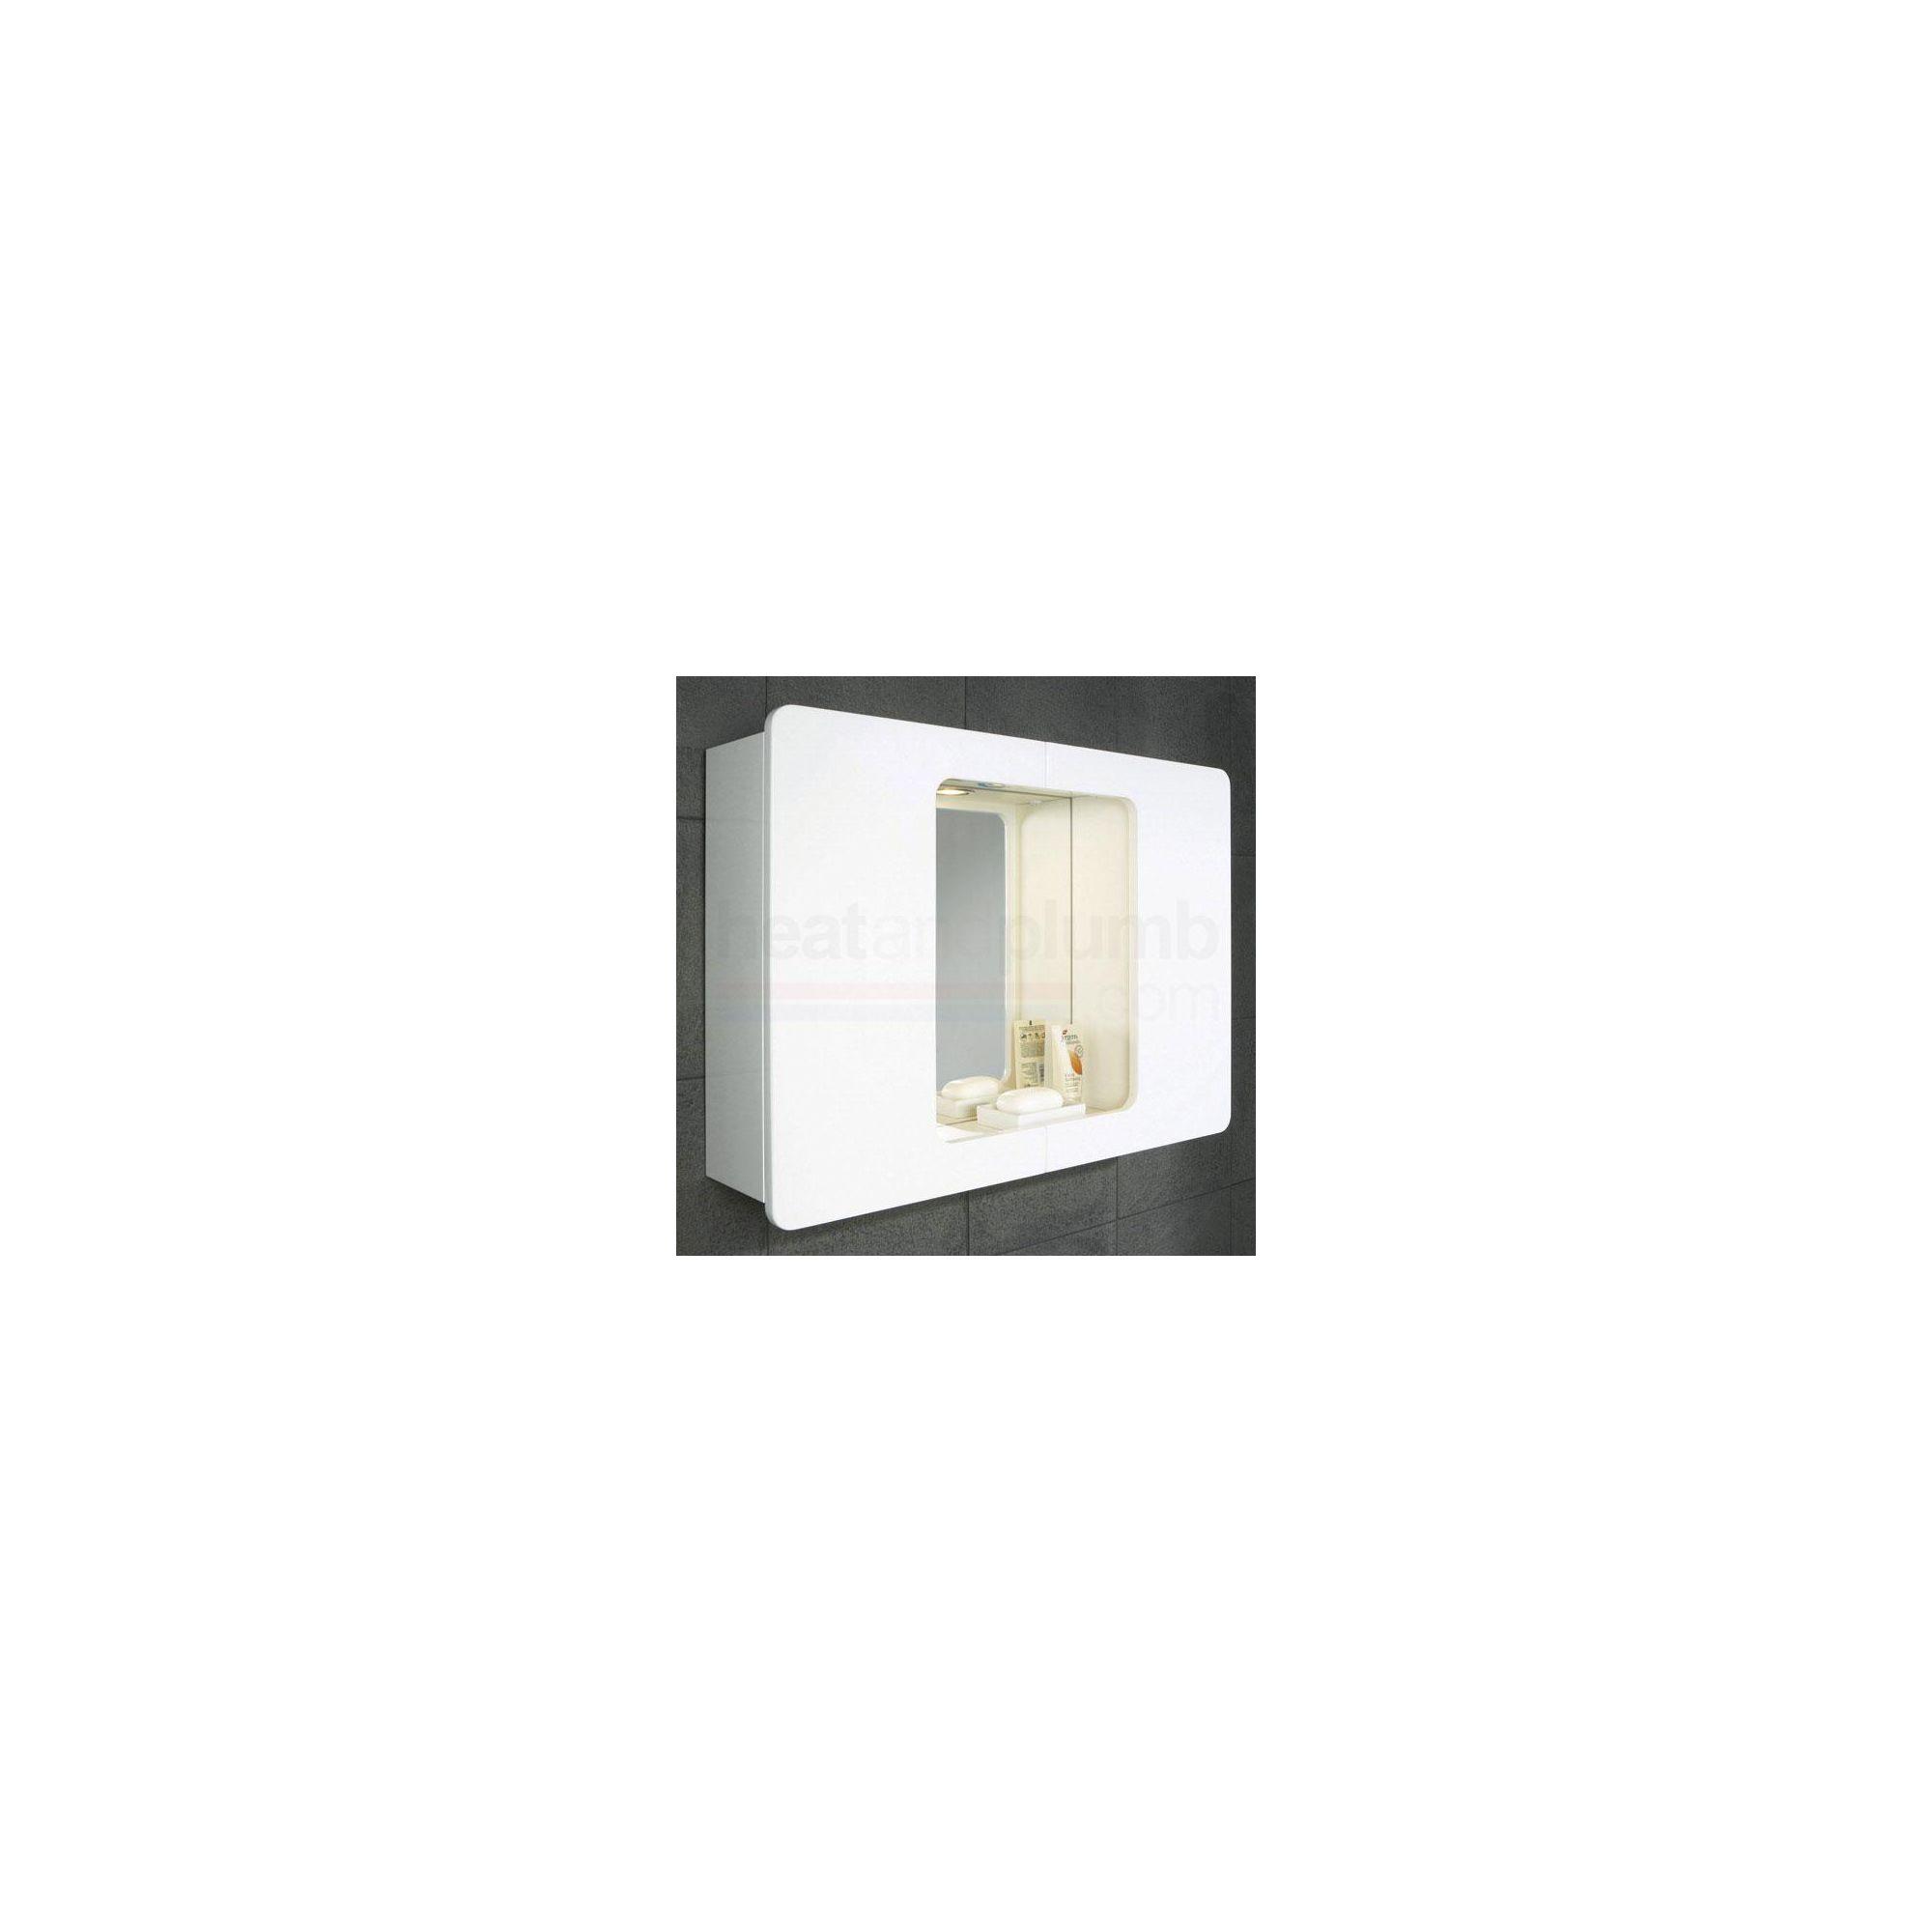 HiB Logan Illuminated Bathroom Cabinet 550mm High x 750mm Wide x 160mm Deep